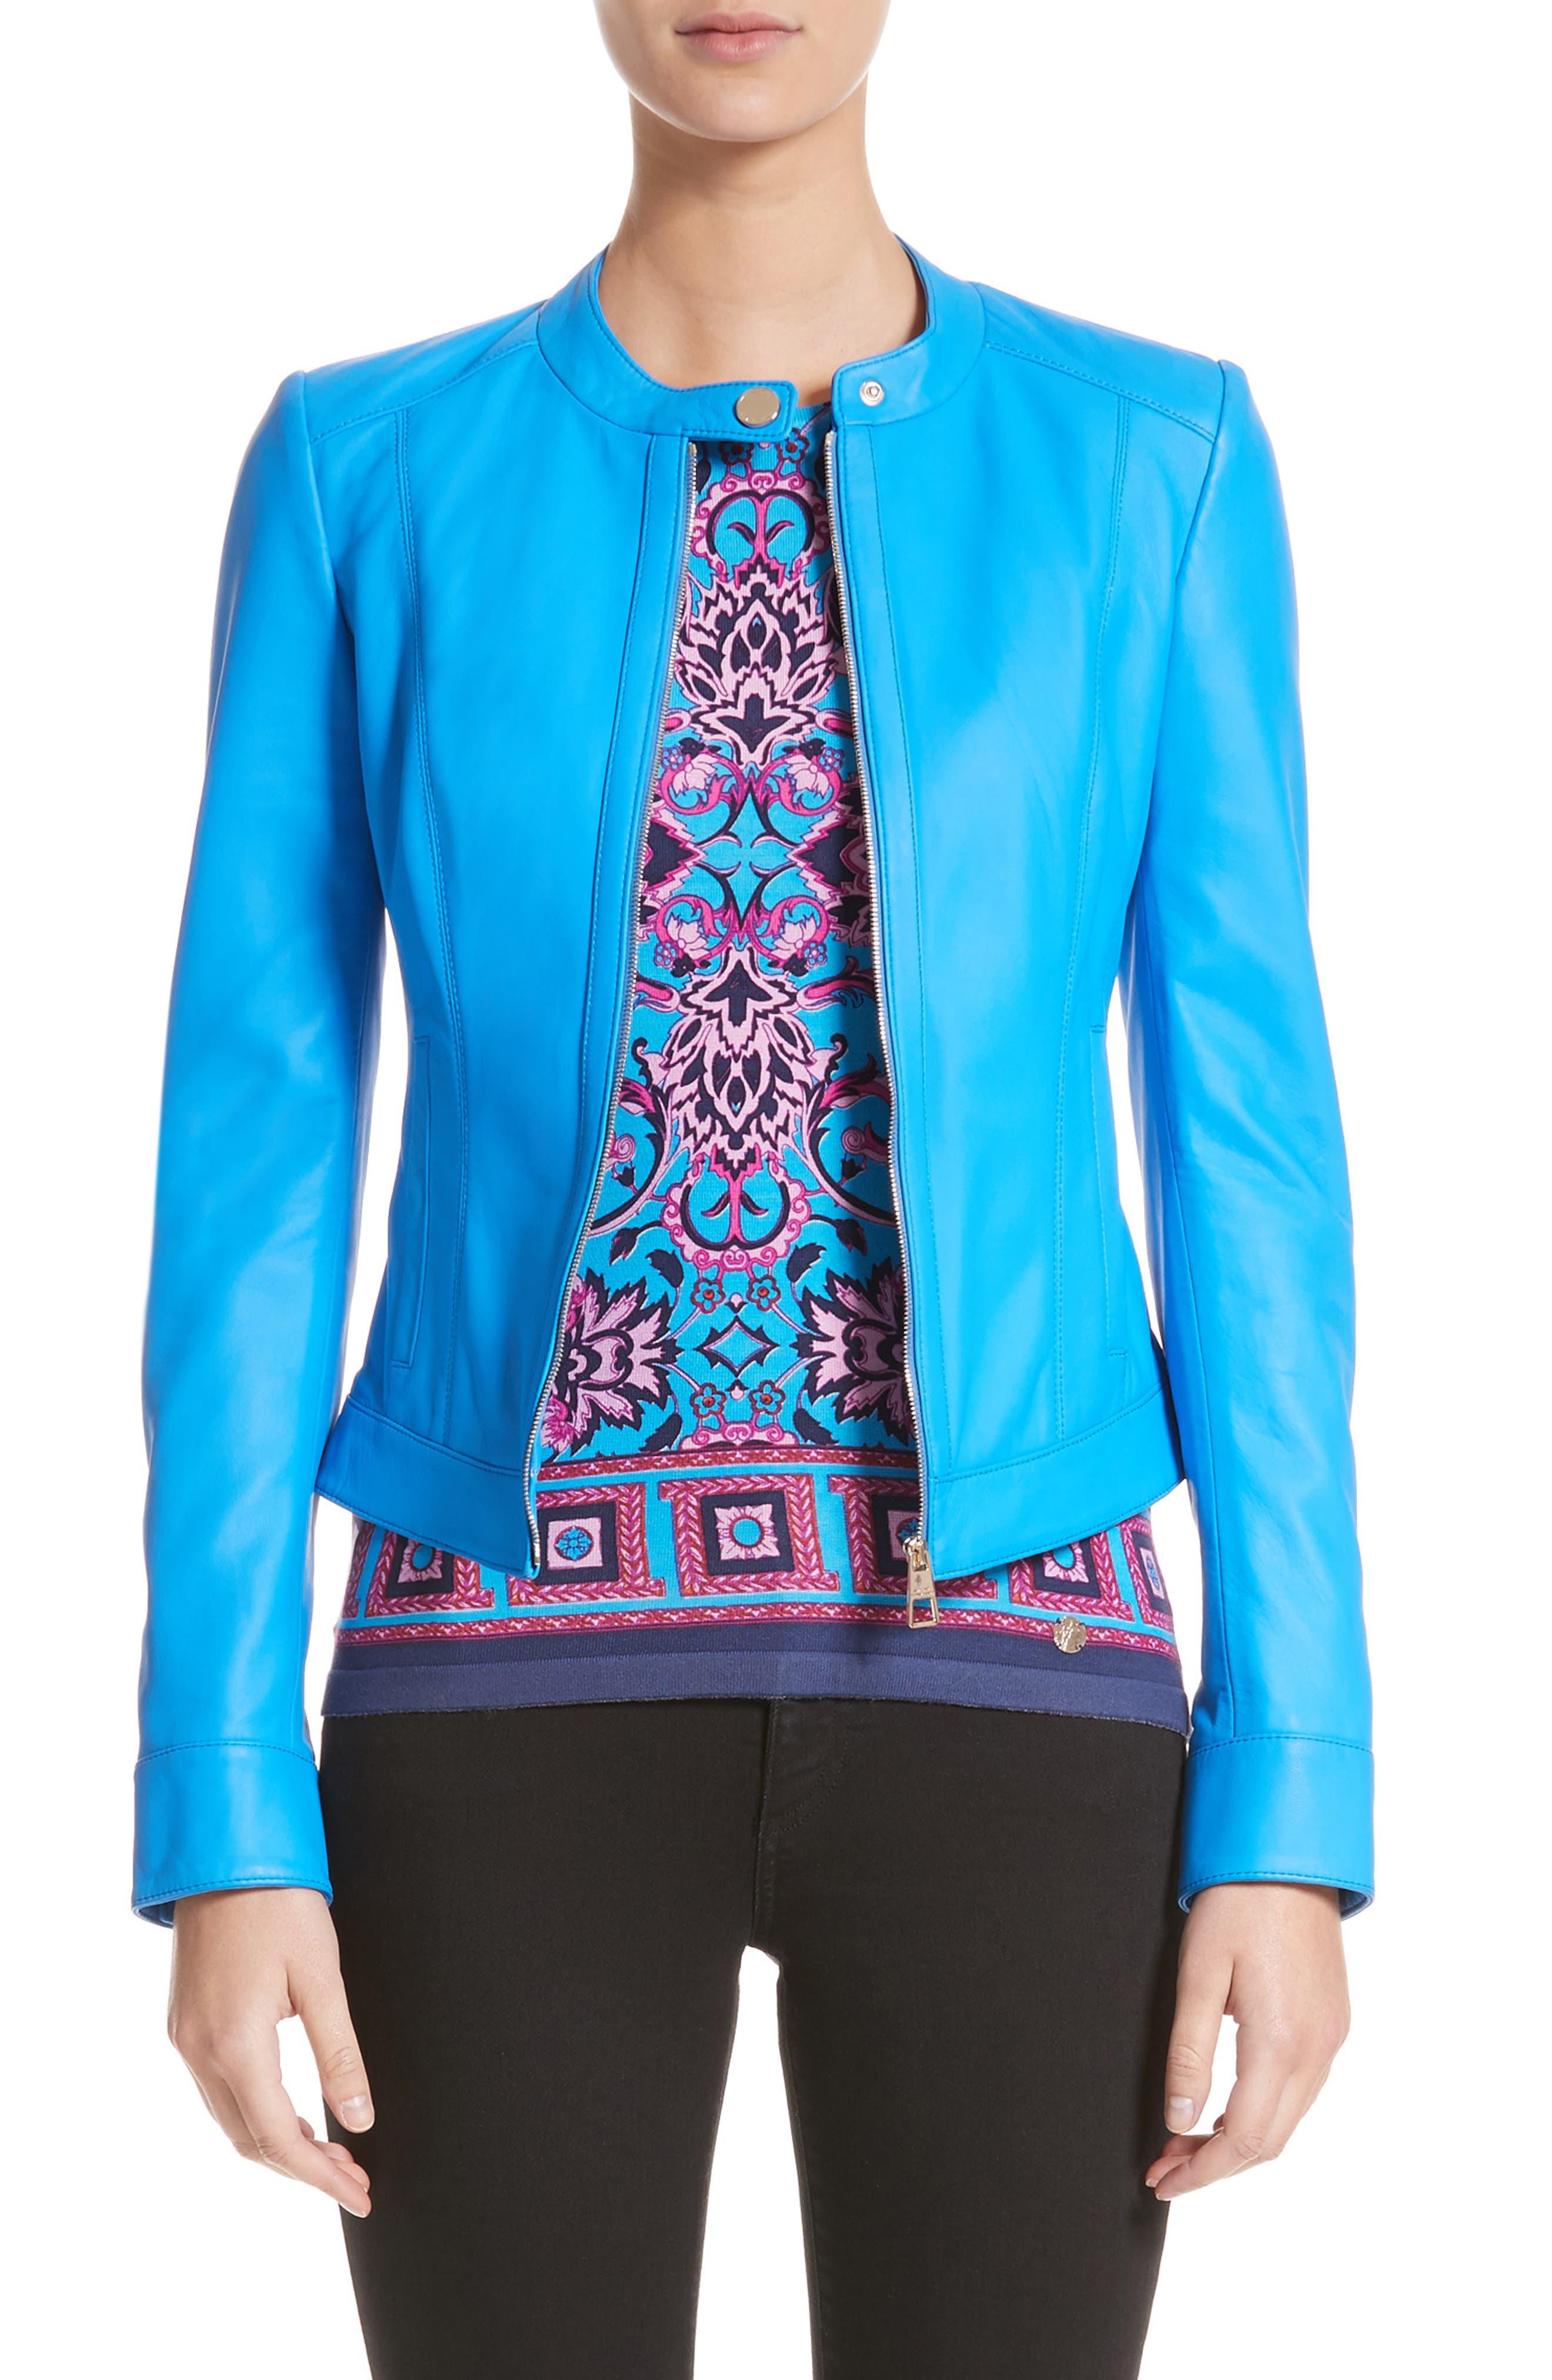 Nappa Leather Jacket,                             Main thumbnail 1, color,                             405